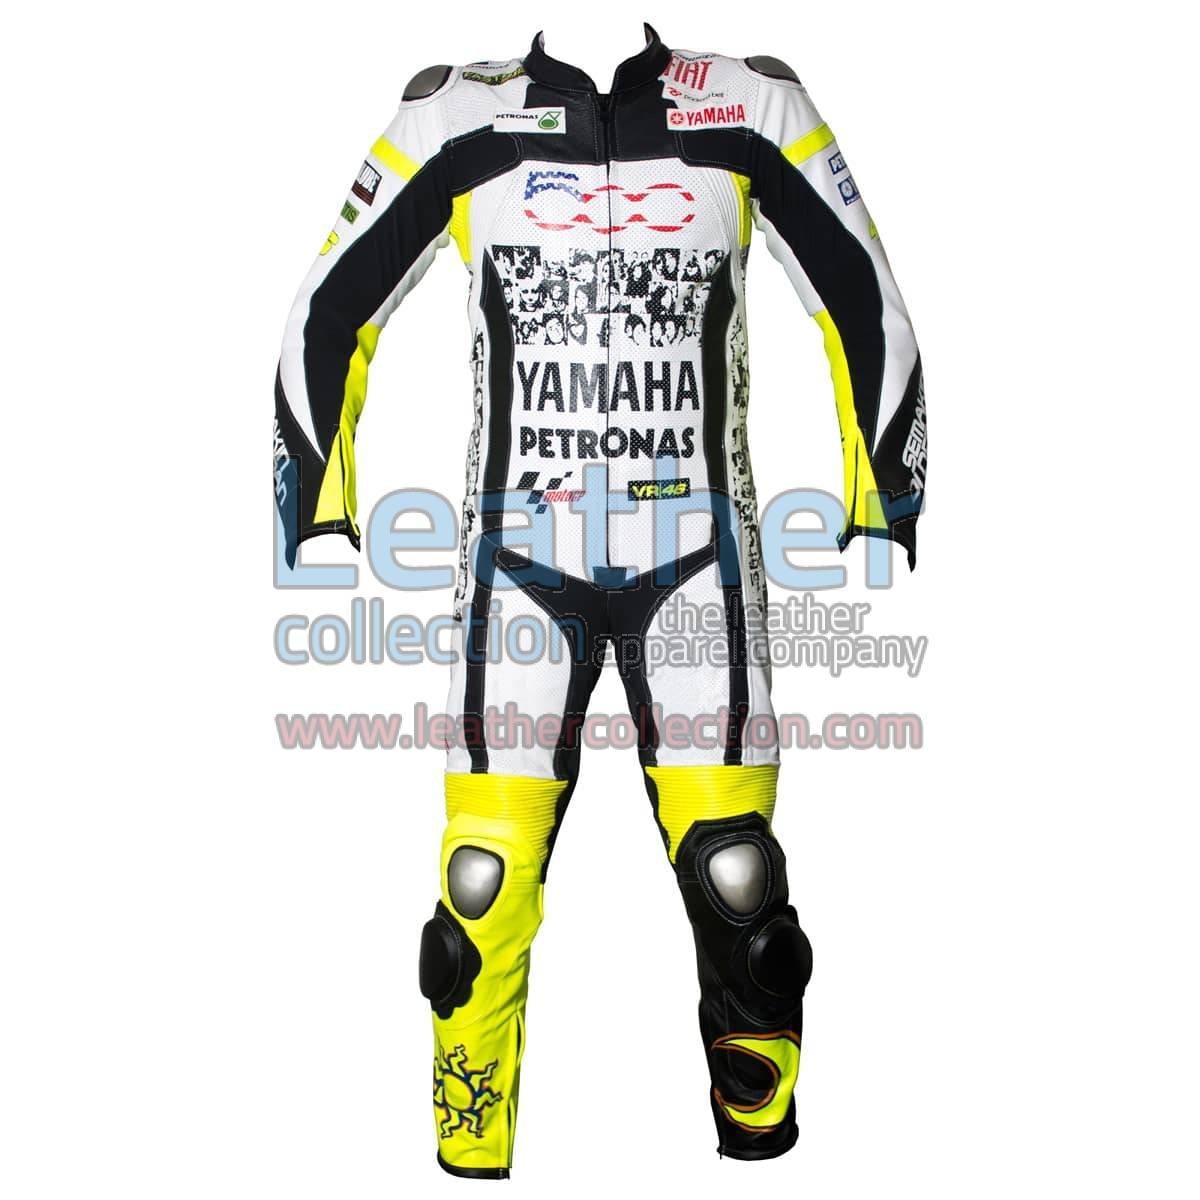 Valentino Rossi Special 500 Mila Race Suit